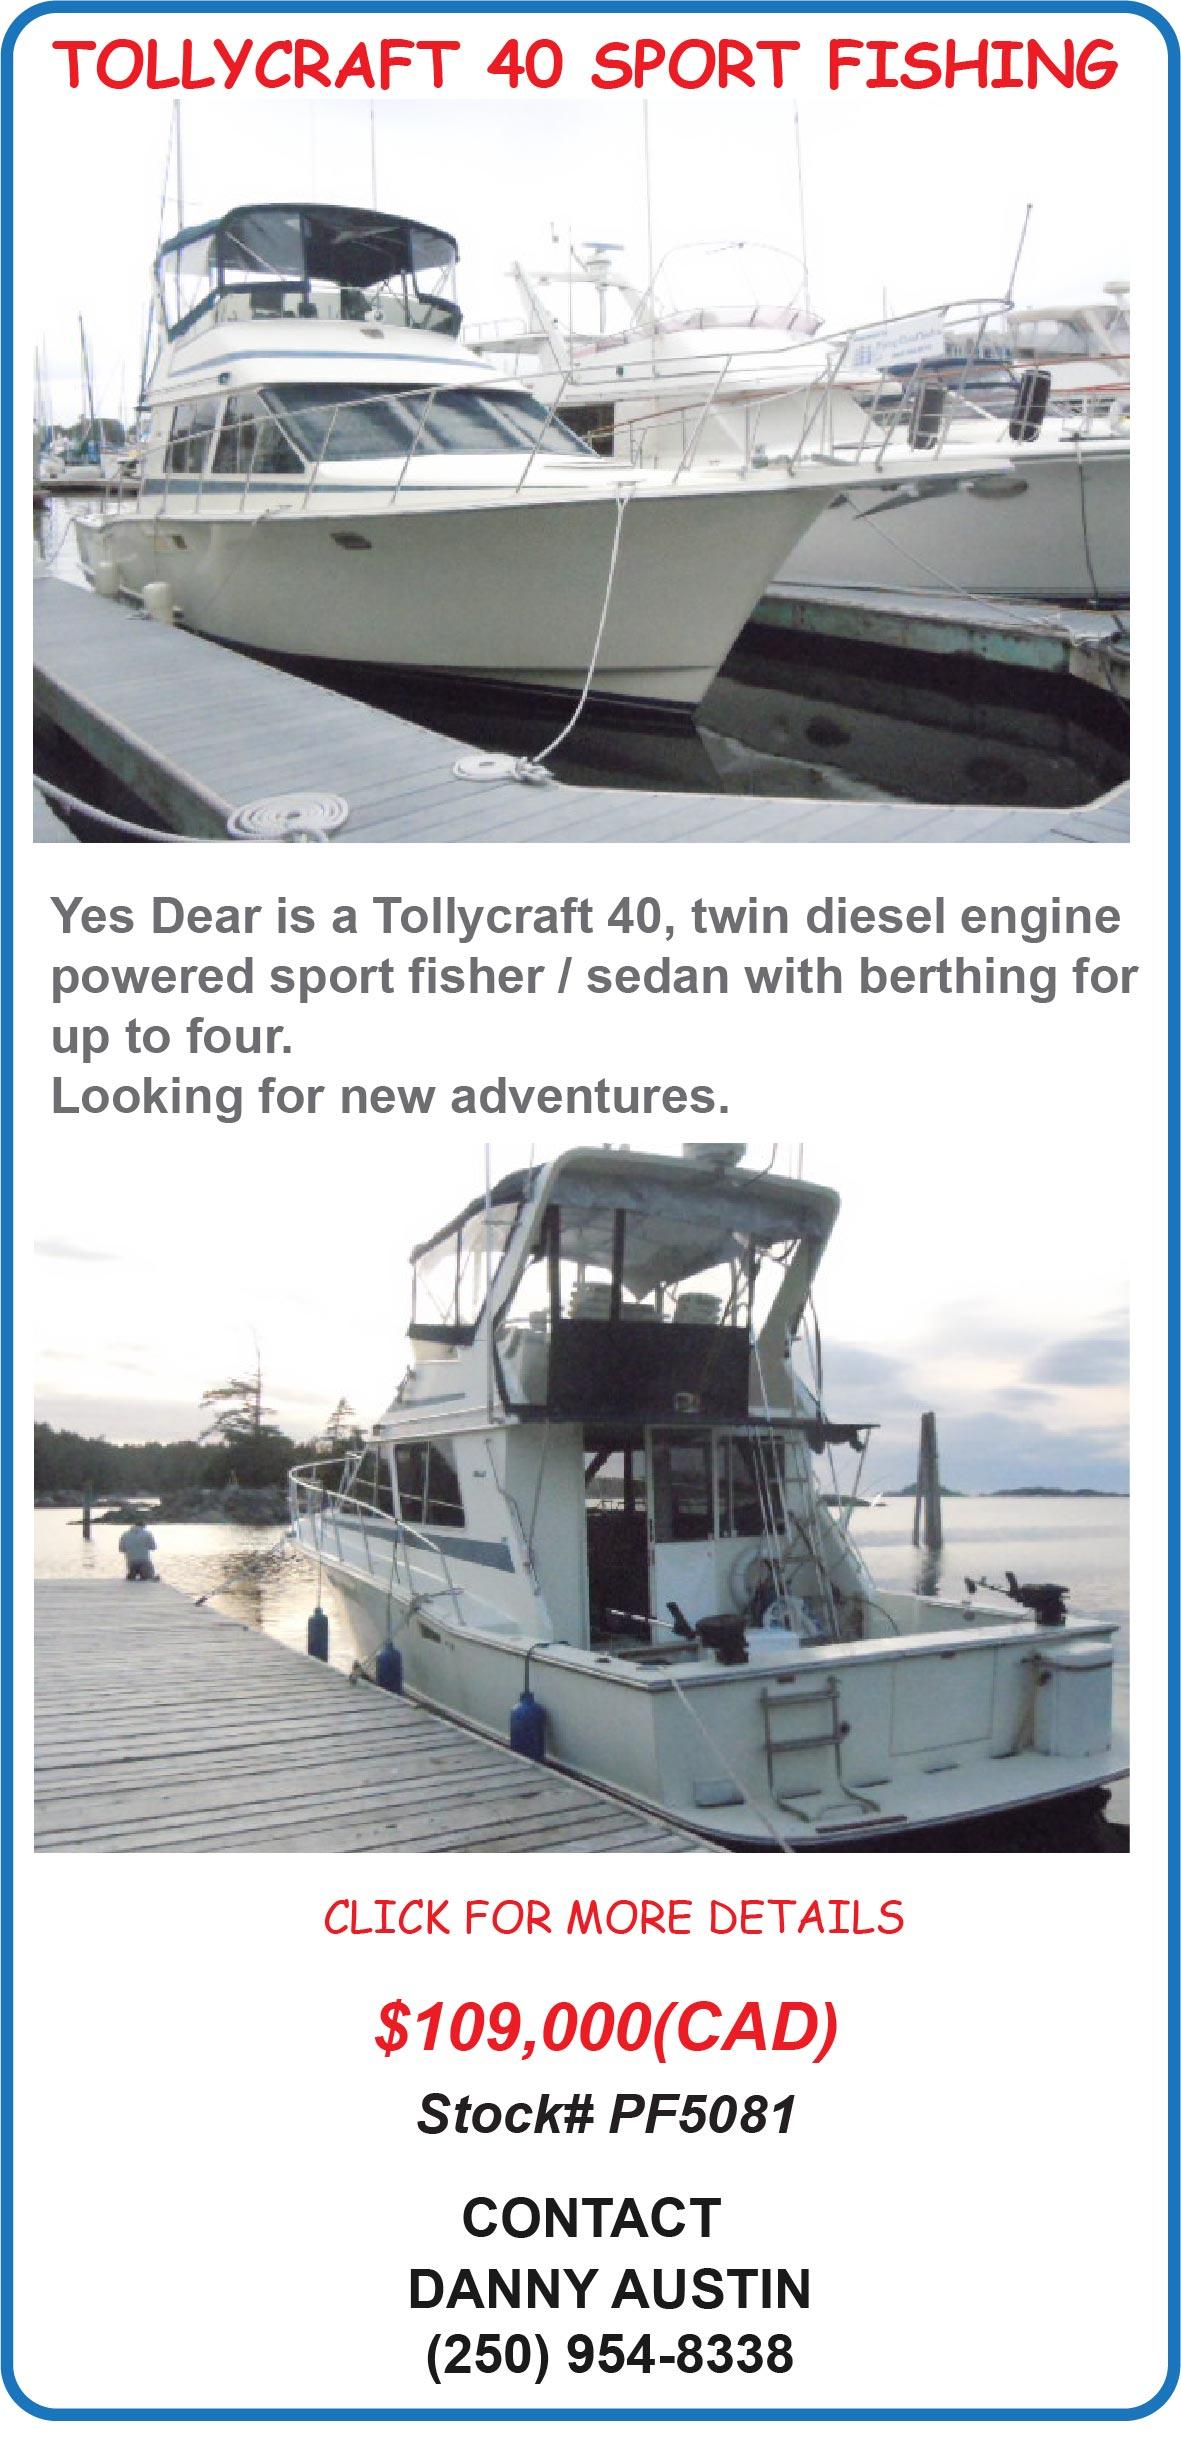 Tollycraft 40 Sport Fishing